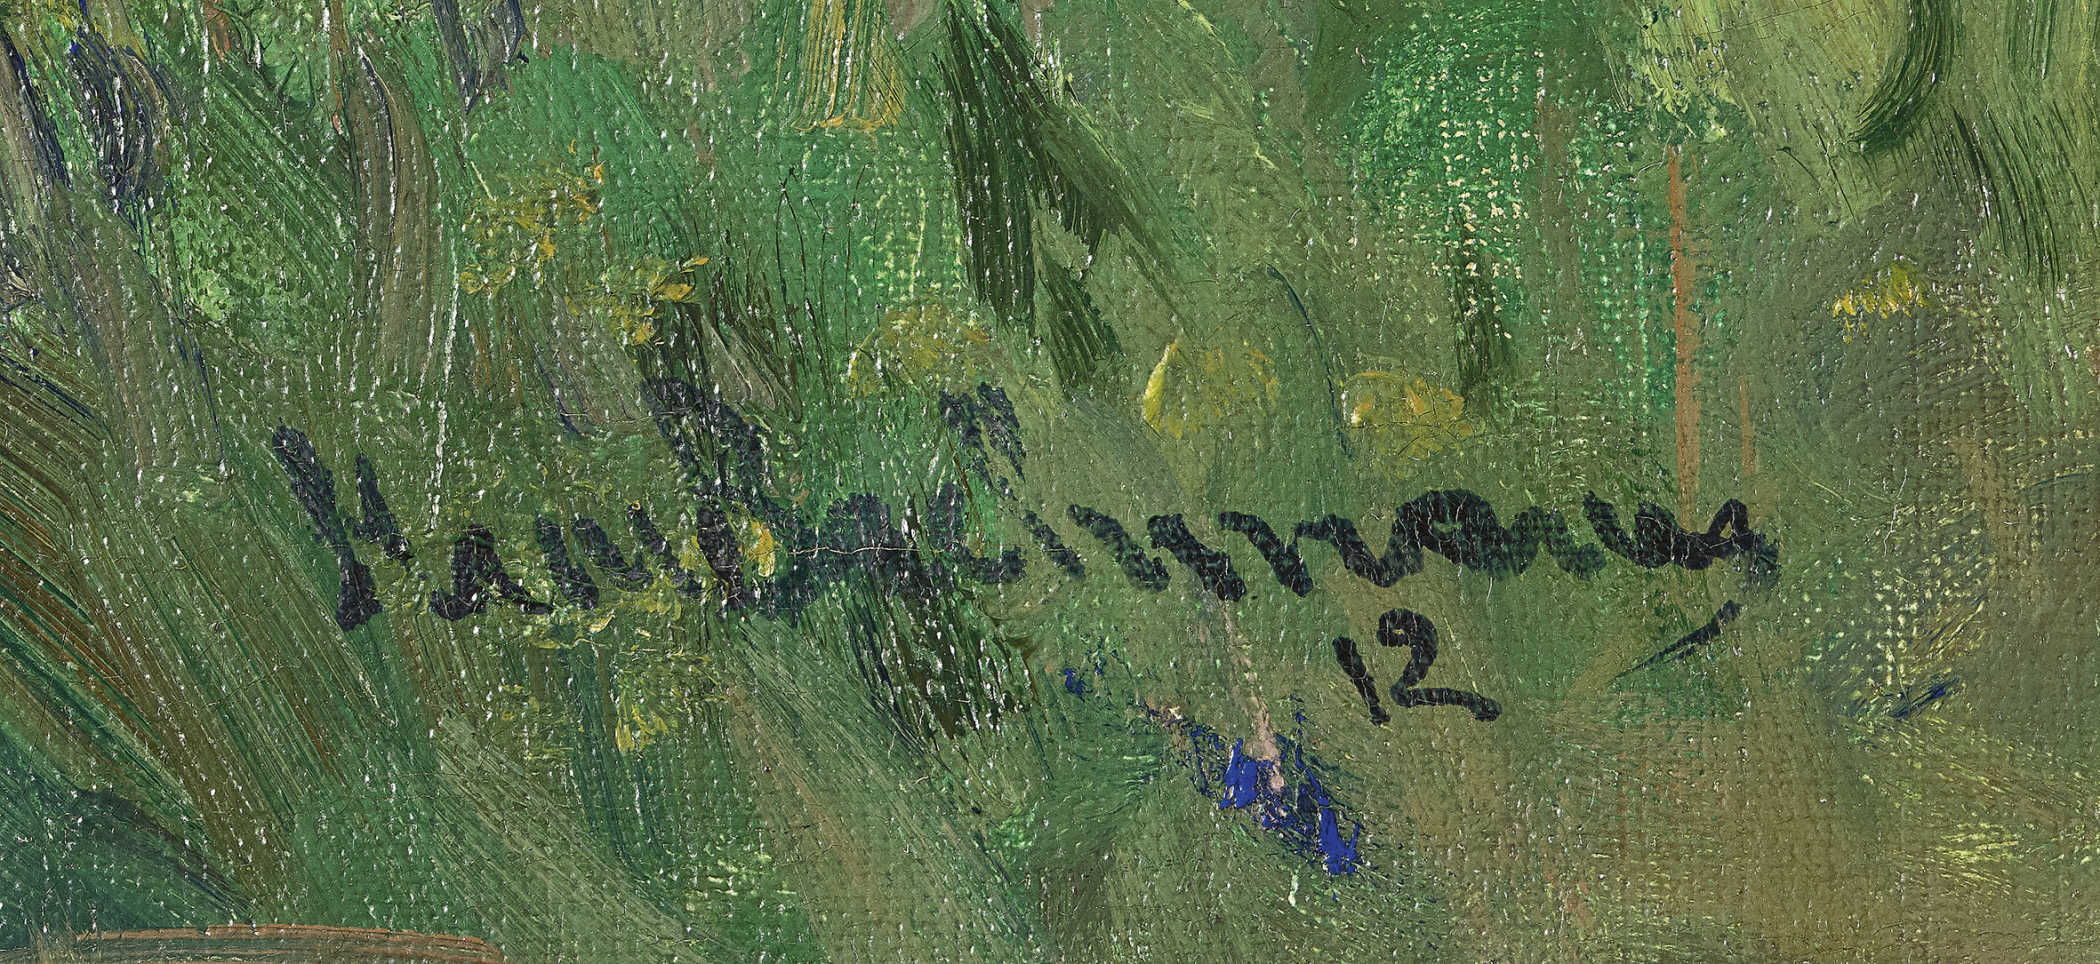 Lot 27 - BACHMANN, HANSWinikon 1852 - 1917 LuzernZ'Nüni.Öl auf Leinwand,sig. u. dat. (19)12 u.l.,